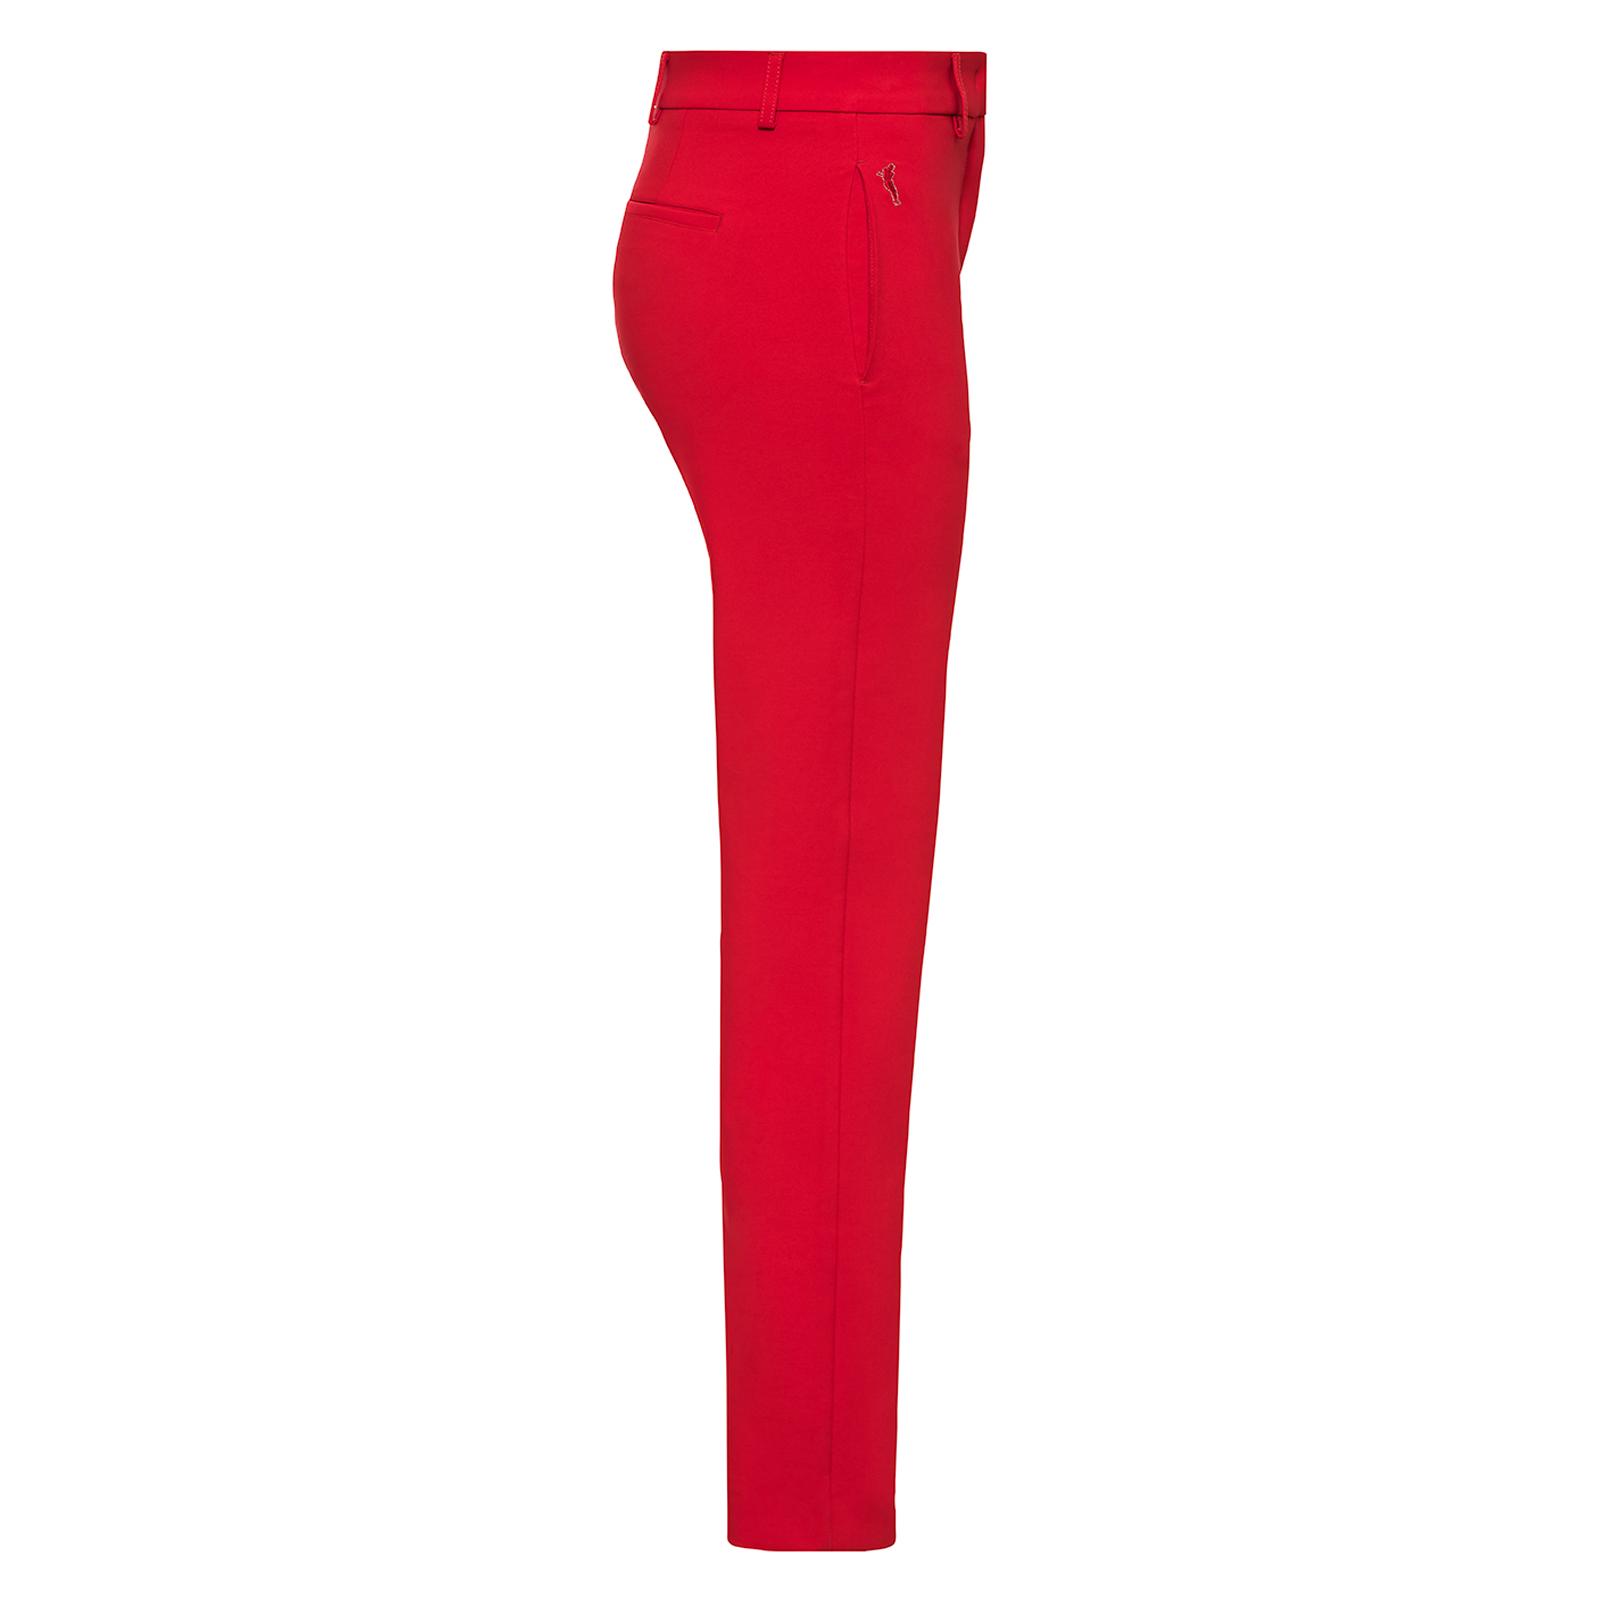 Damen 7/8-Golfhose mit Stretch-Funktion